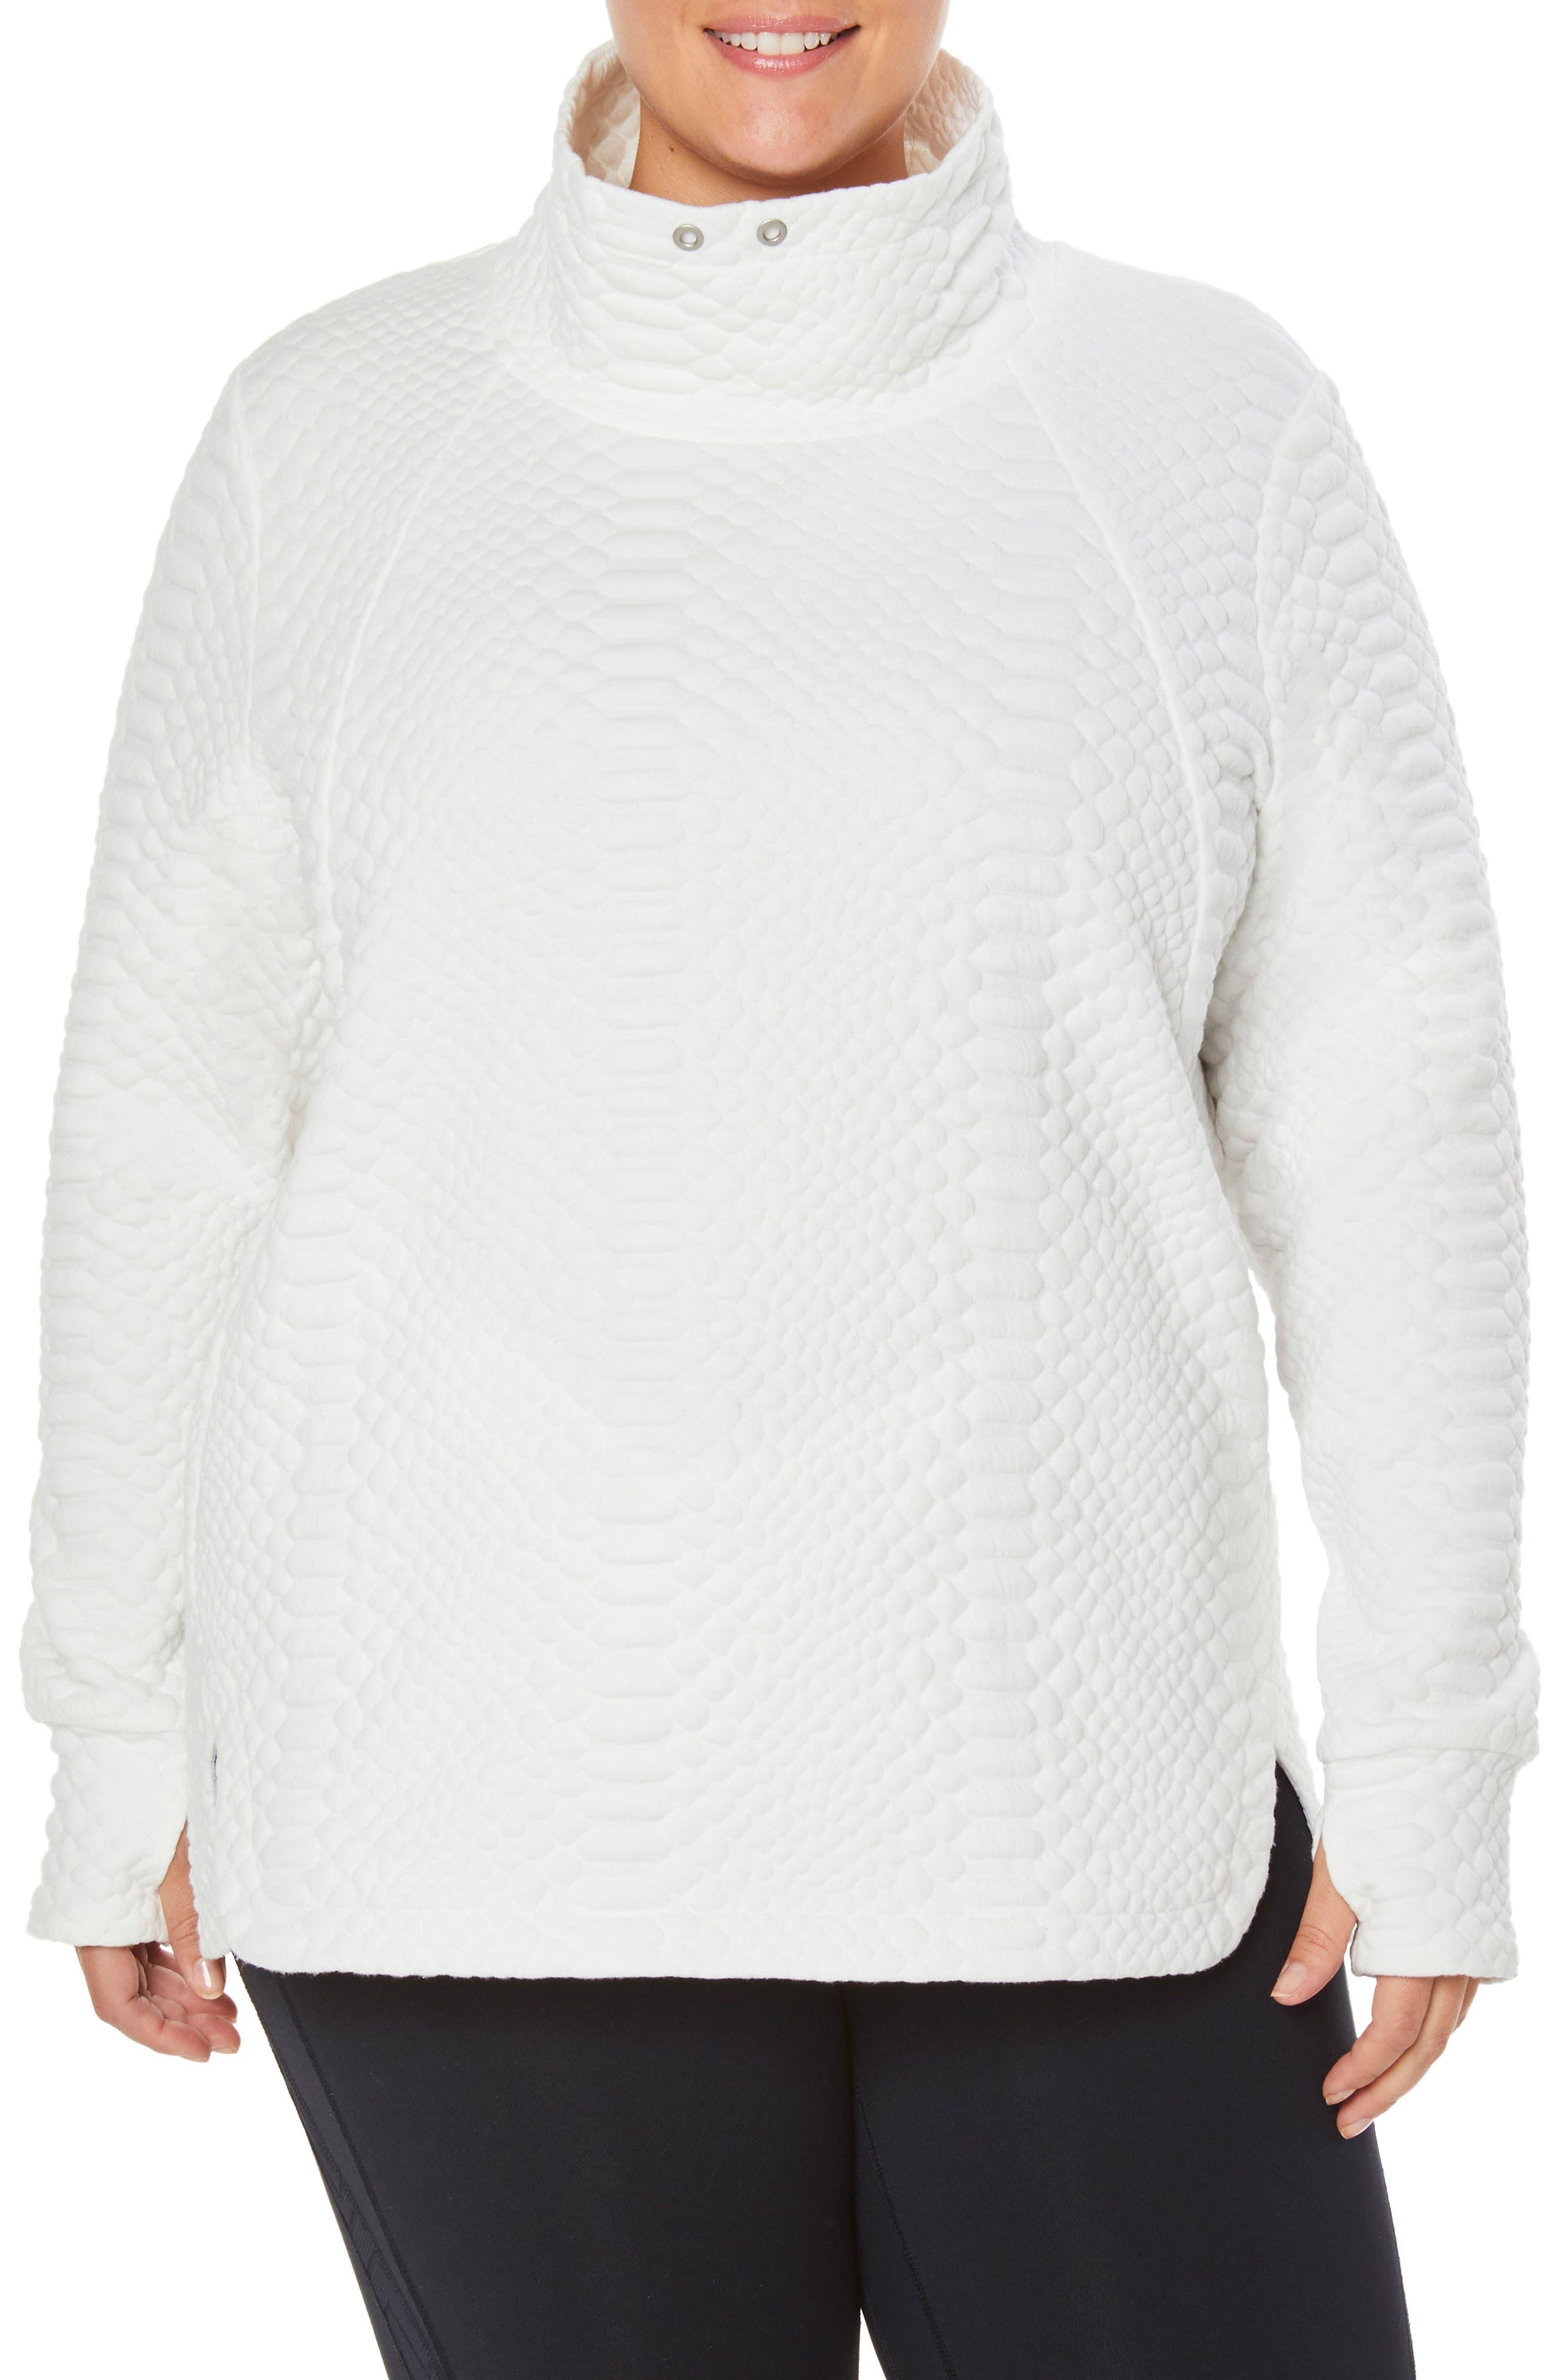 Saturday Mock Neck Pullover,                             Main thumbnail 1, color,                             WINTER WHITE